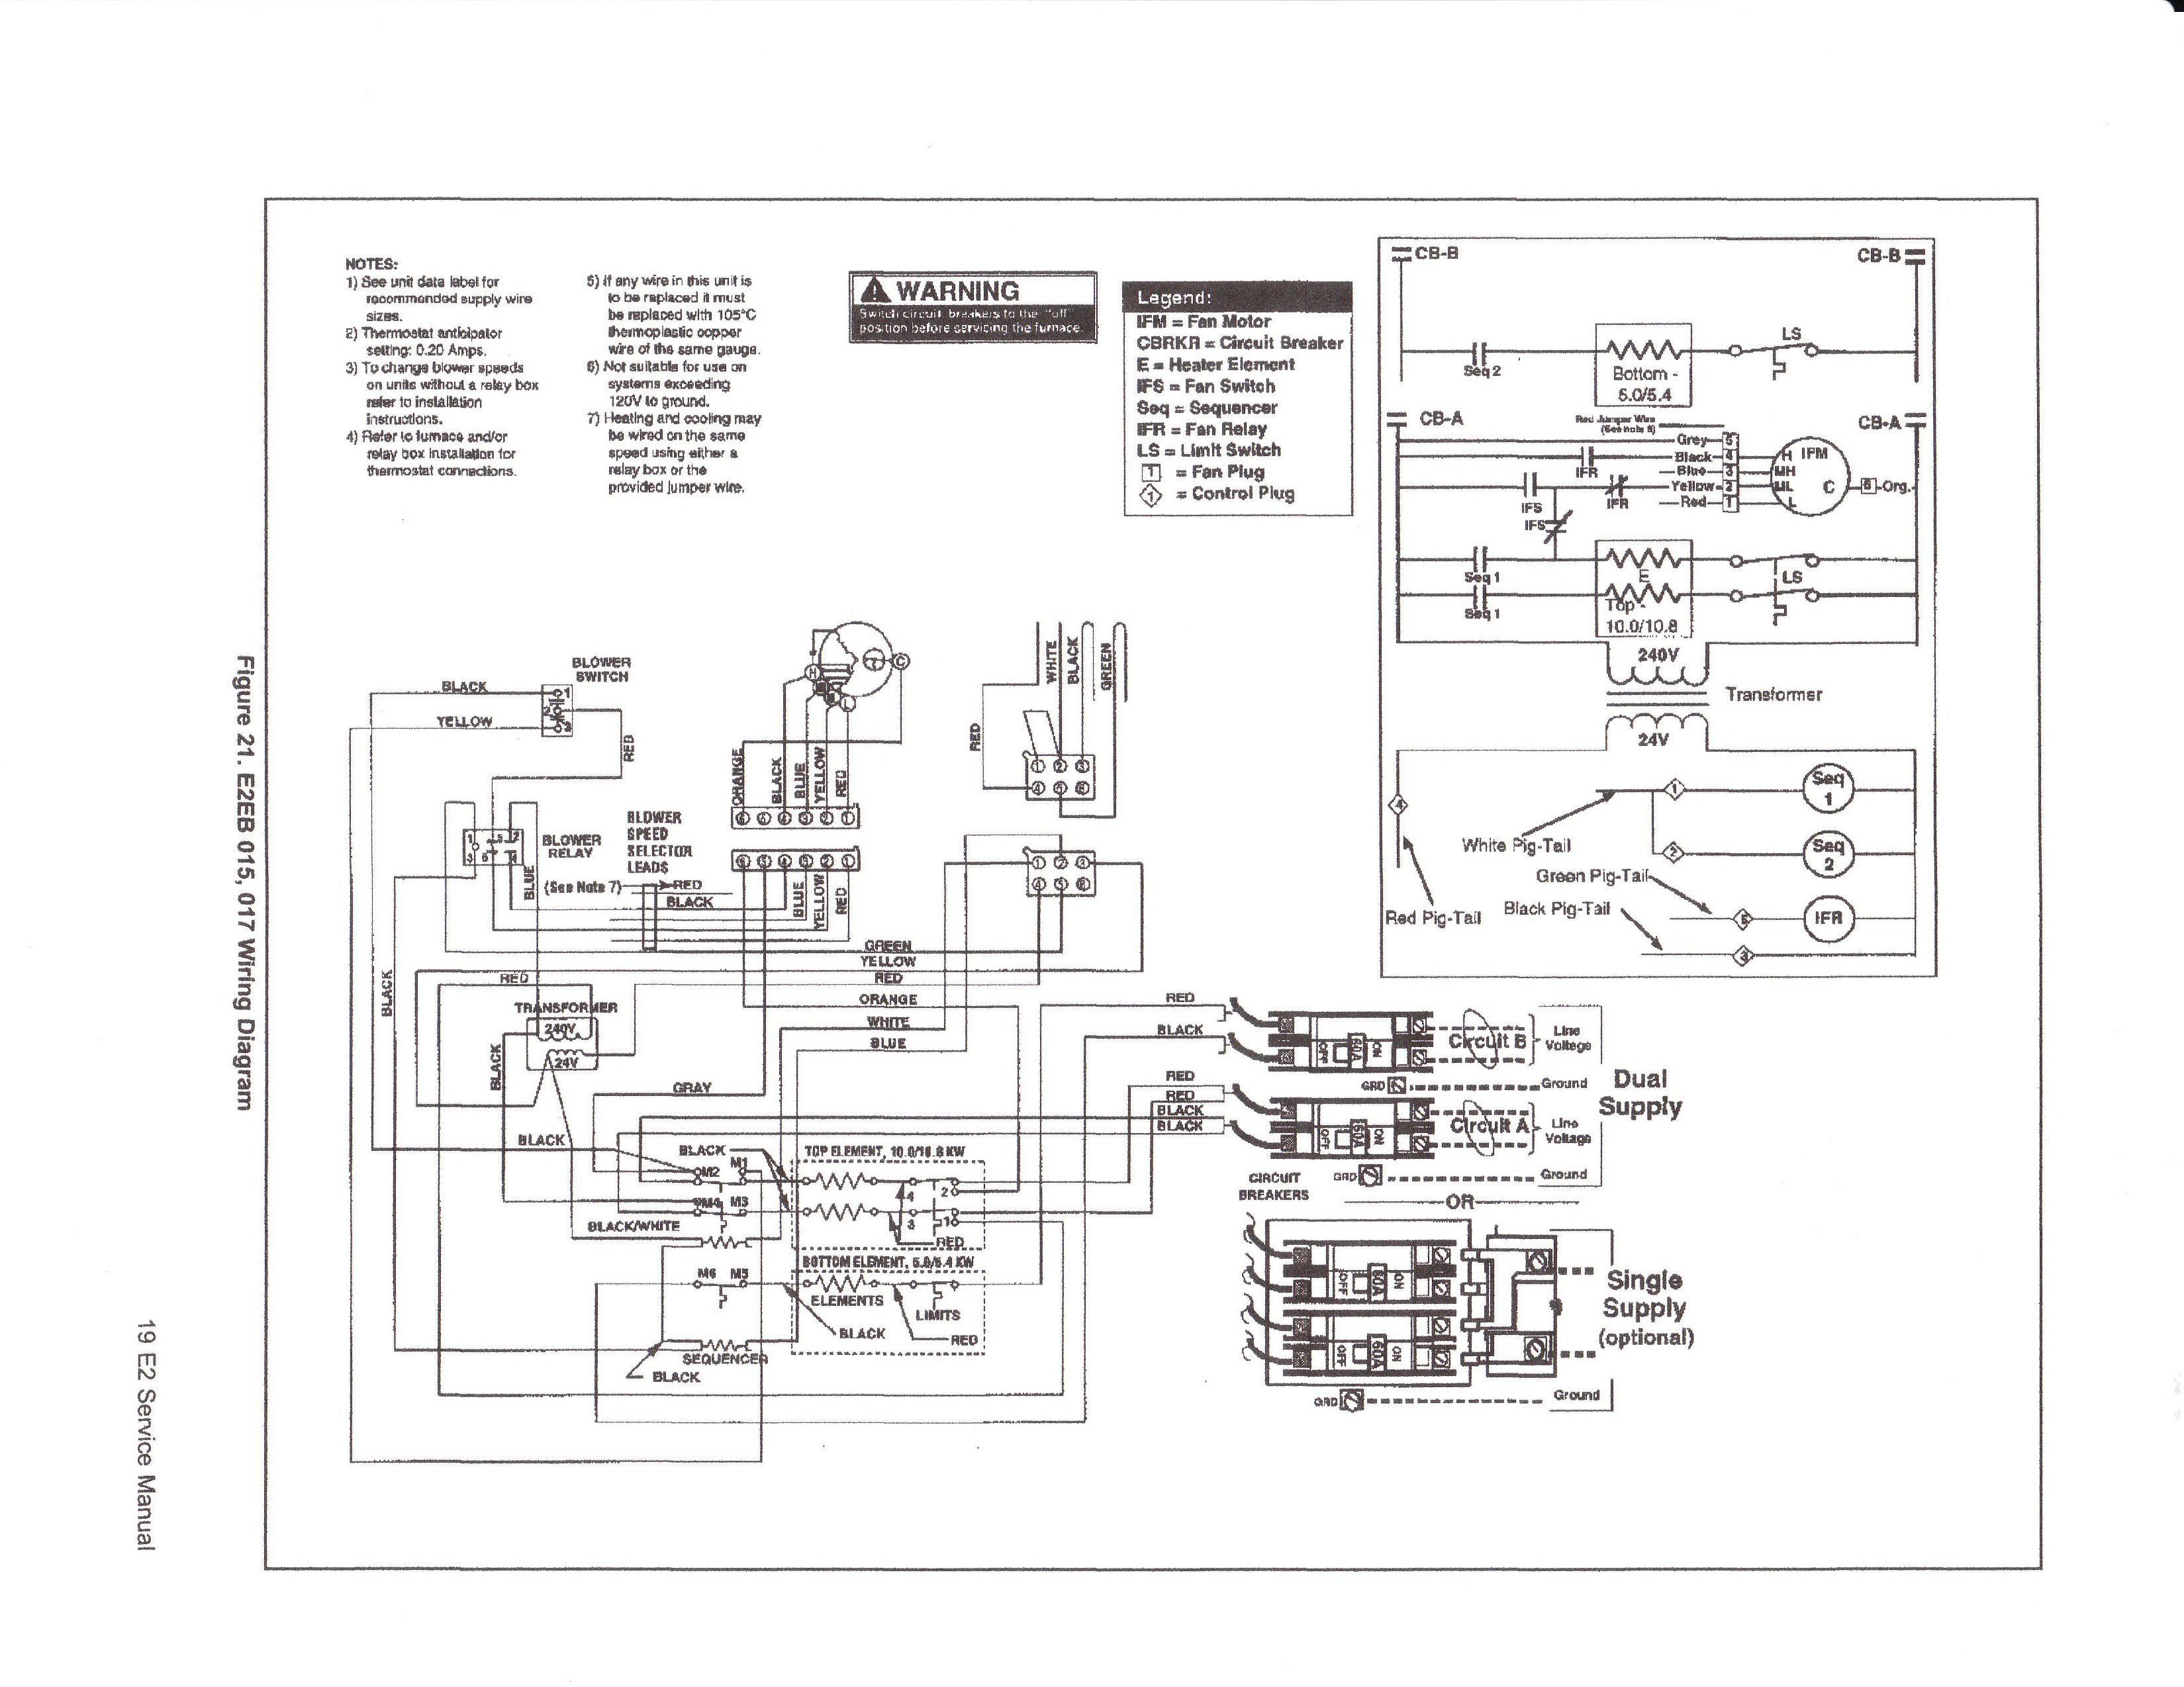 Intertherm Electric Furnace Wiring Diagram Unique Intertherm Sequencer Wiring Diagram